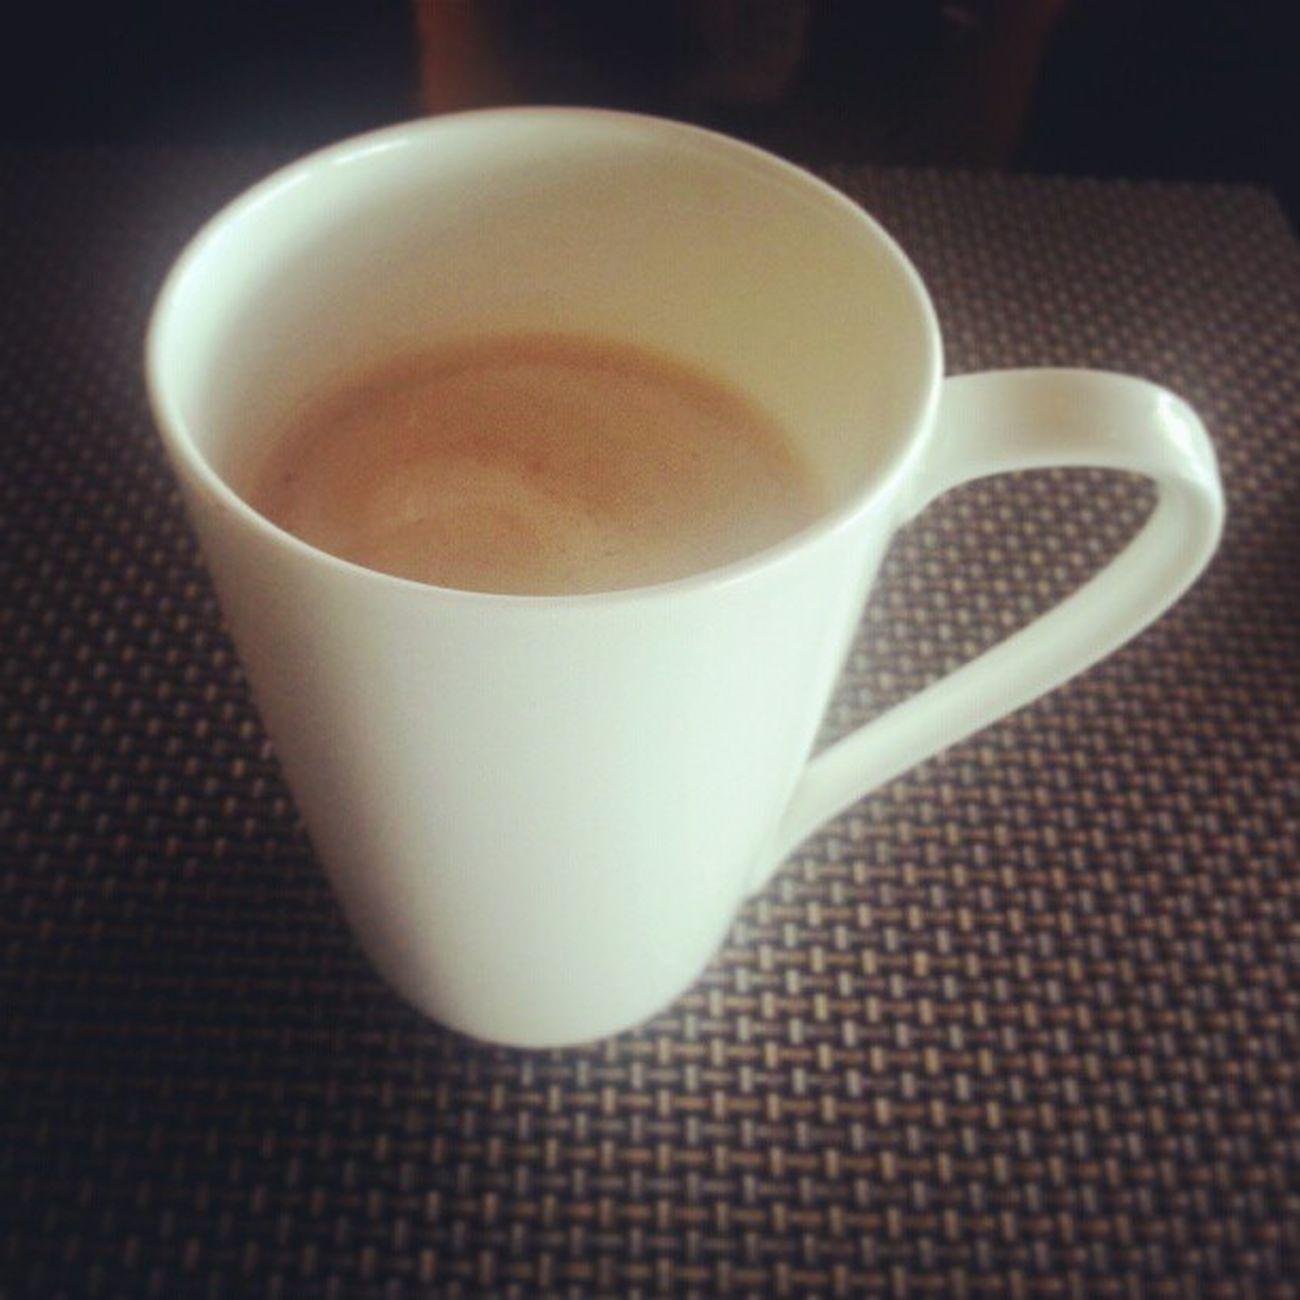 Bfast Bfast Morning Hotel Semarang crowne coffee indo indonesia insta instagram